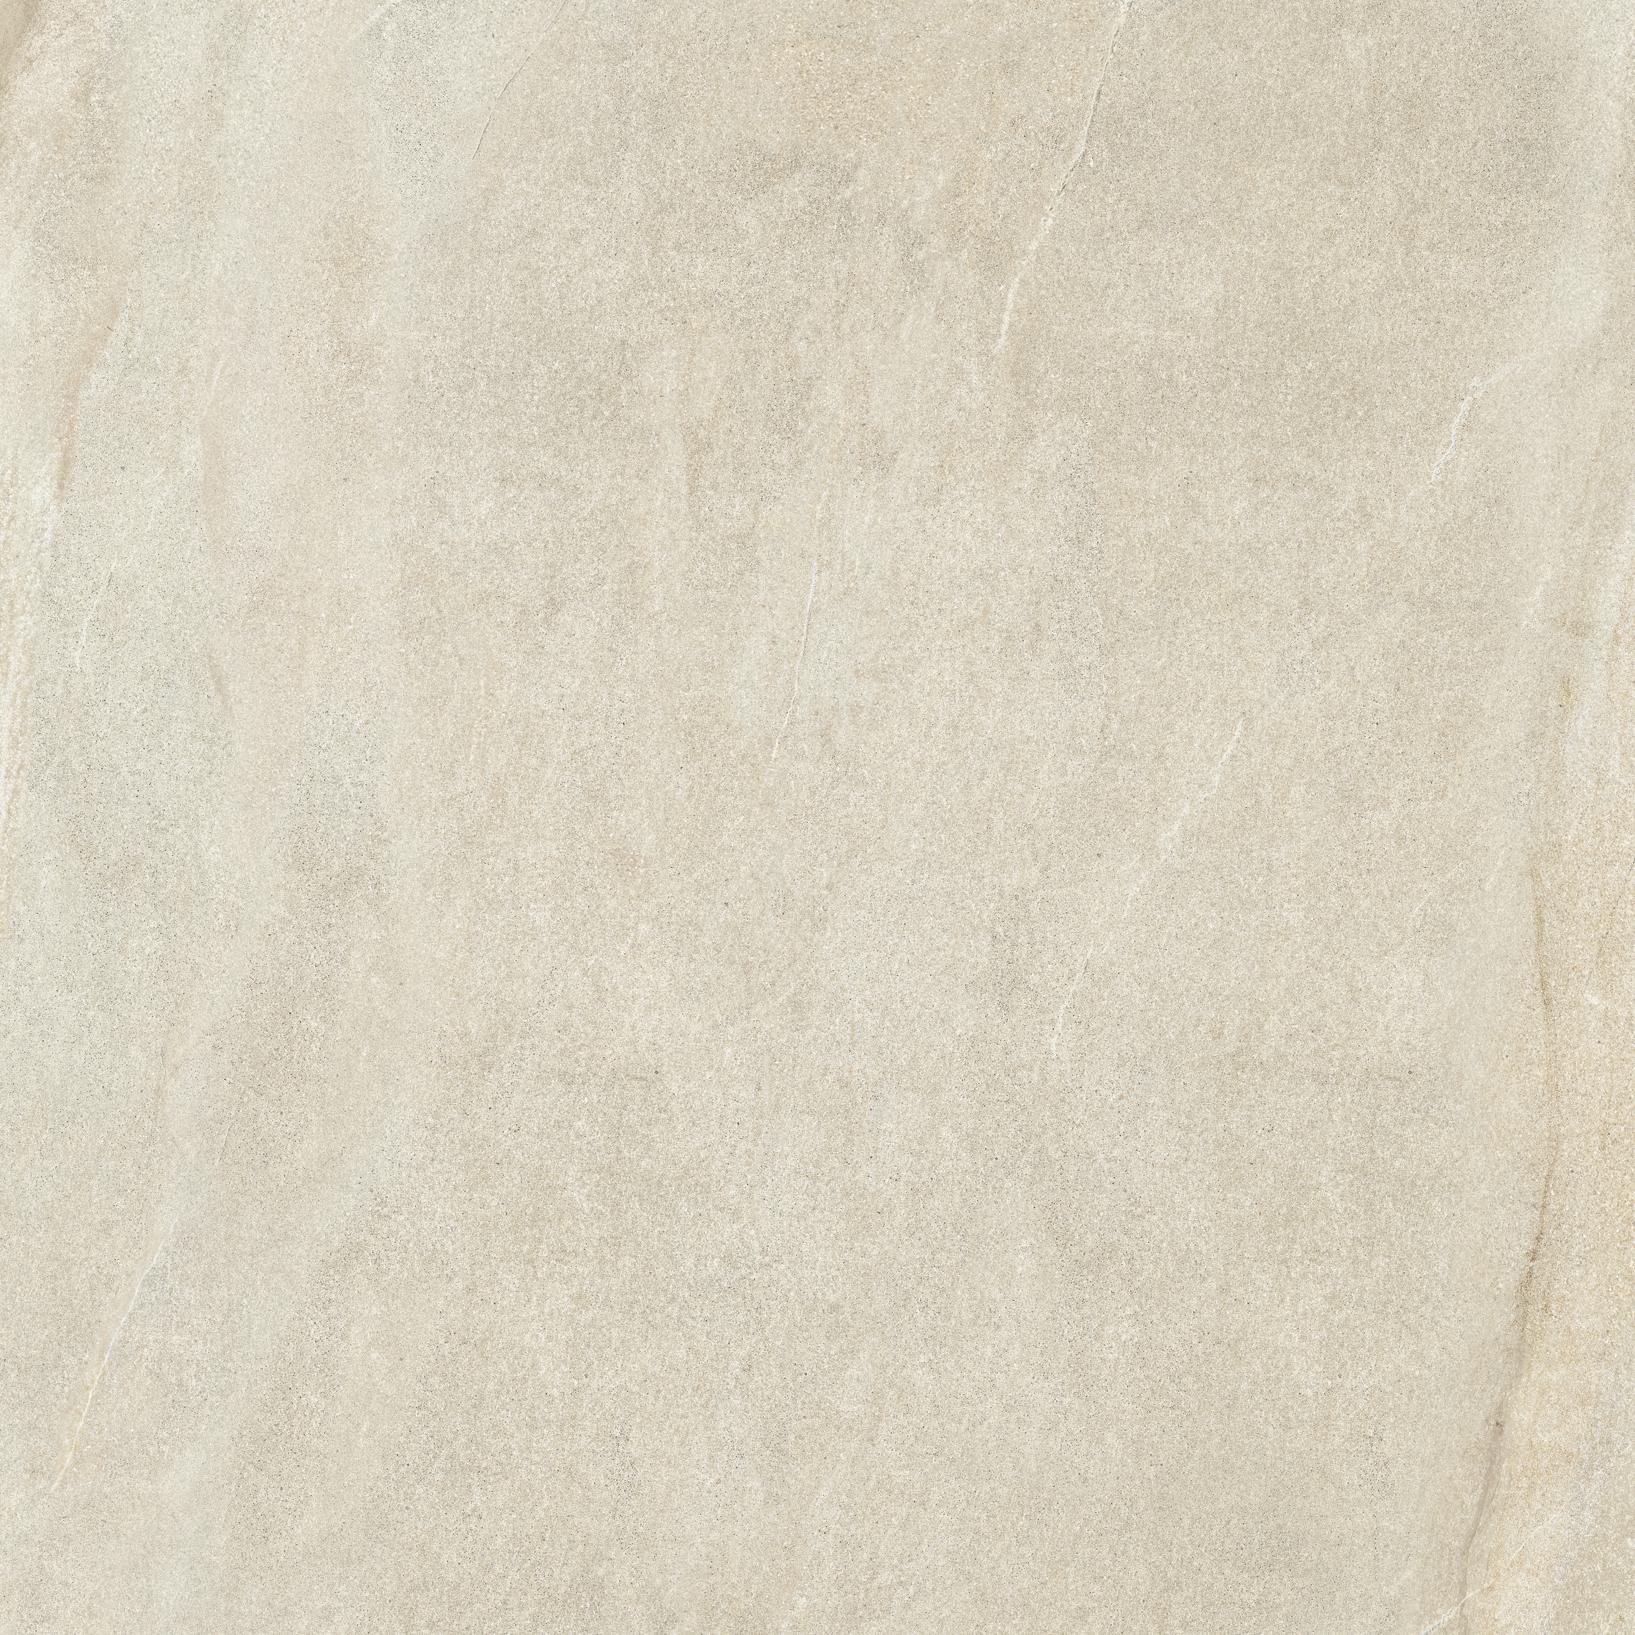 Charisma Luxor (카리스마 룩소르 600*600)